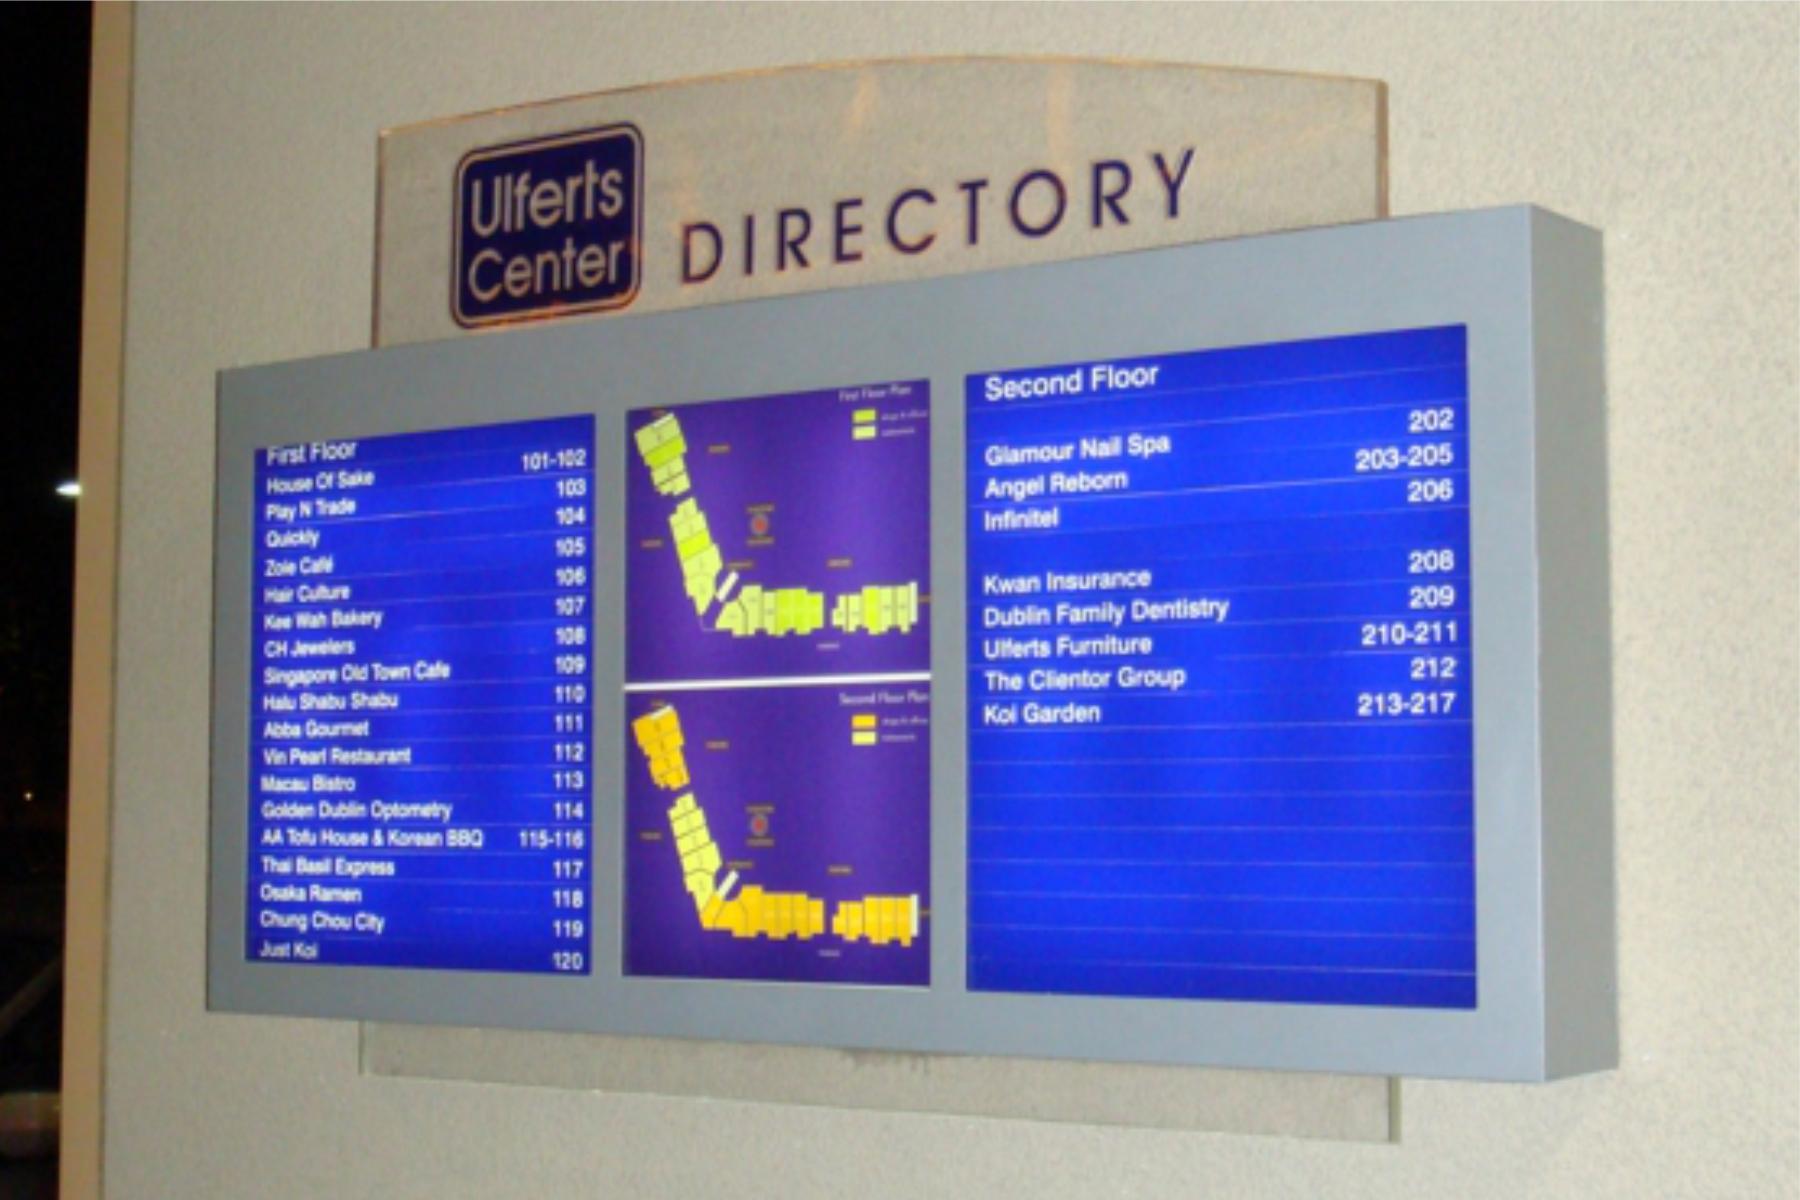 Ulferts Center